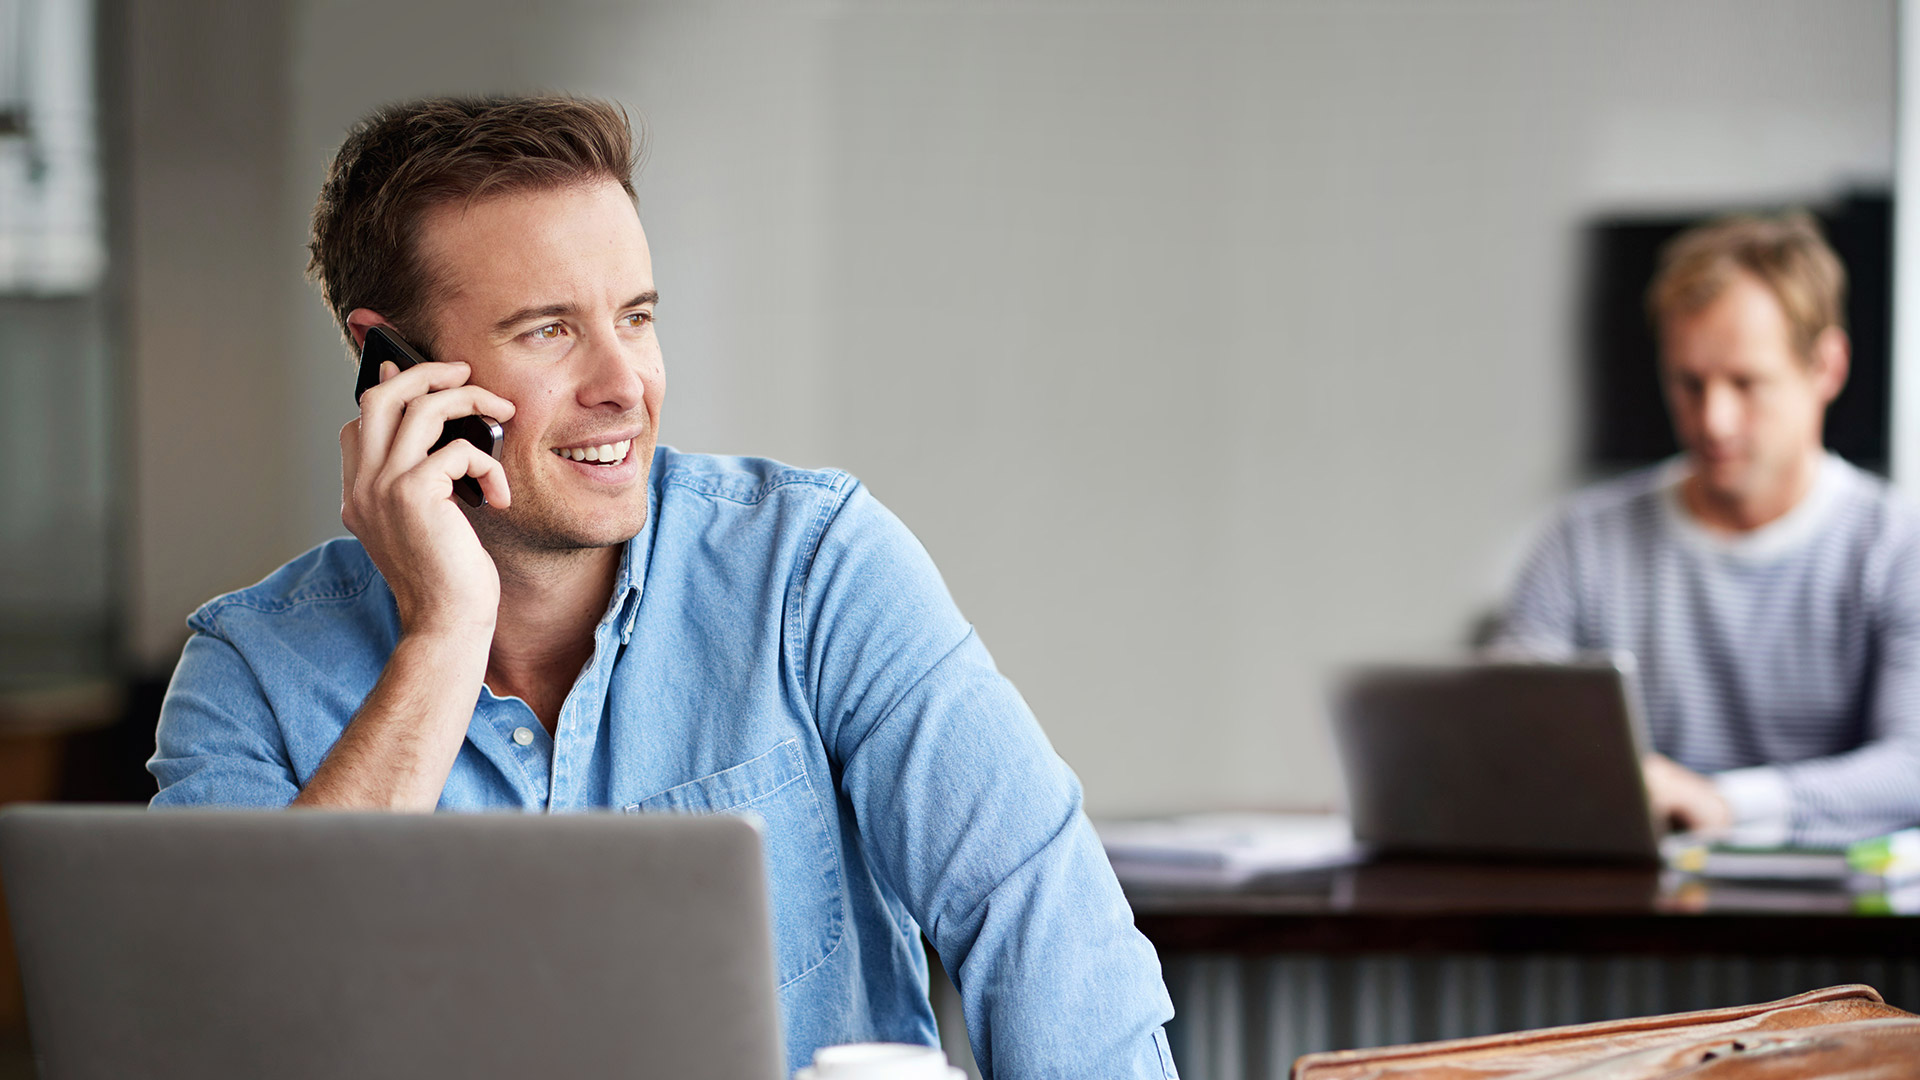 Business Manager bei Telefonkonferenz